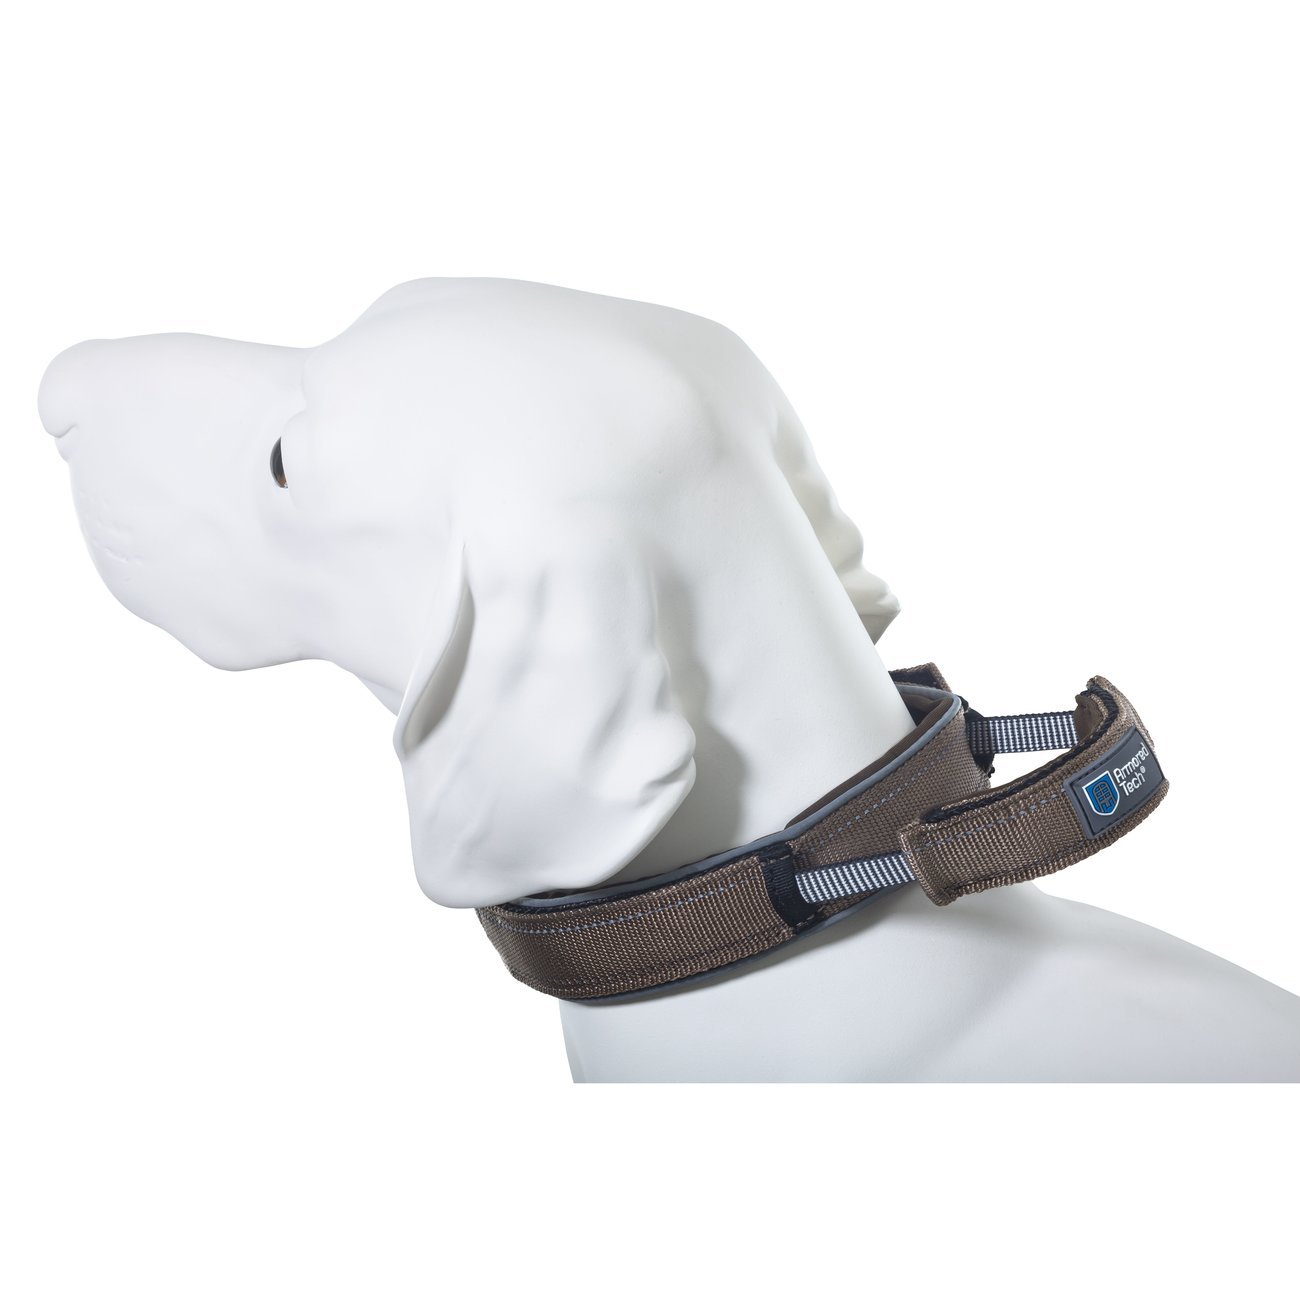 Armored Tech ArmoredTech Hundehalsband, Bild 6